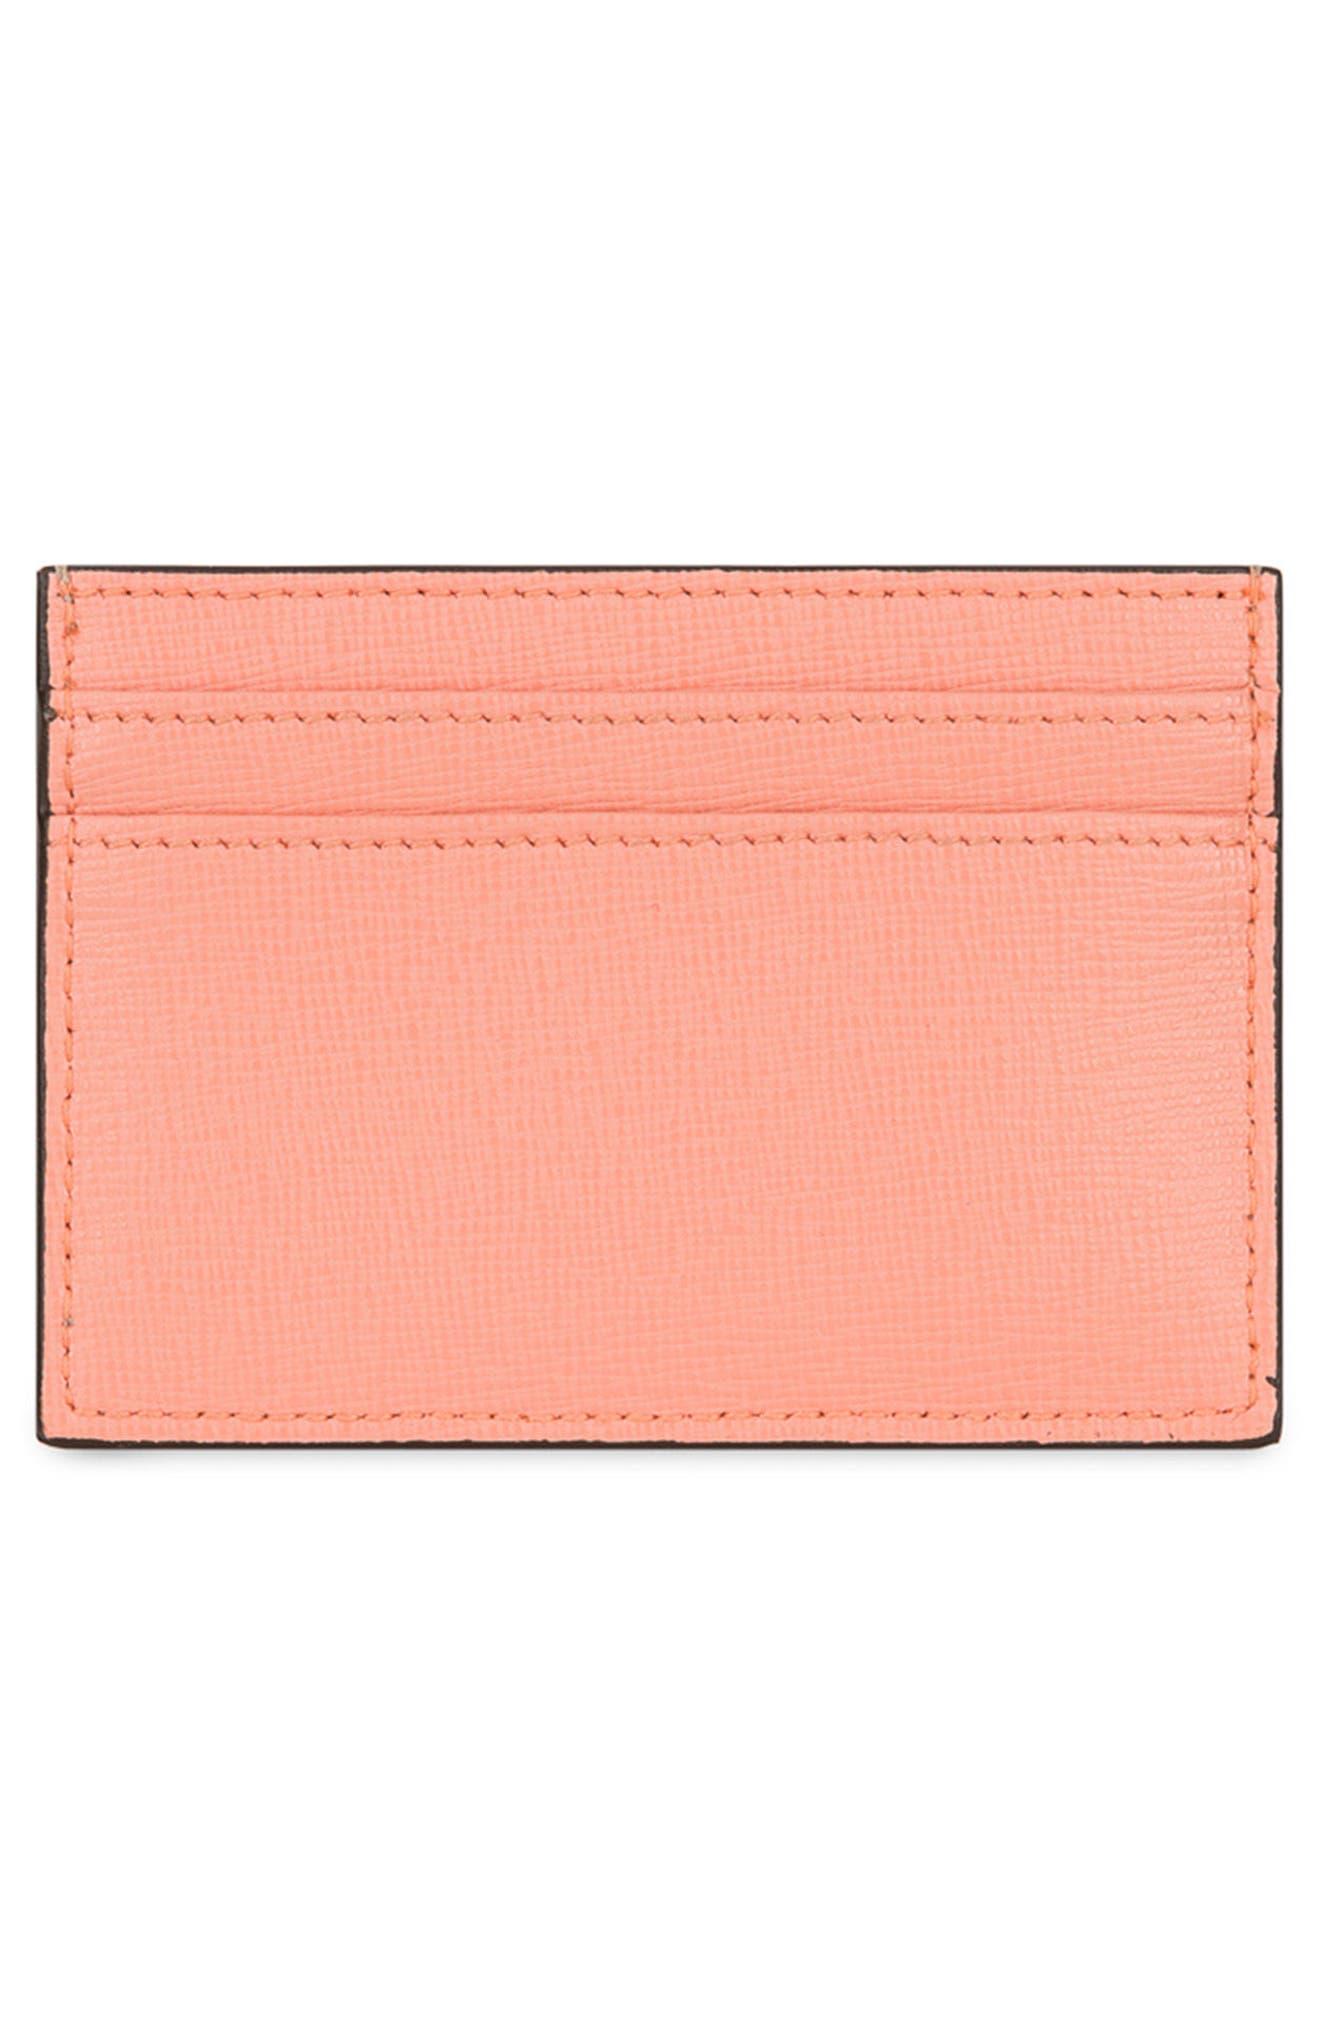 Babylon Saffiano Leather Card Case,                             Alternate thumbnail 8, color,